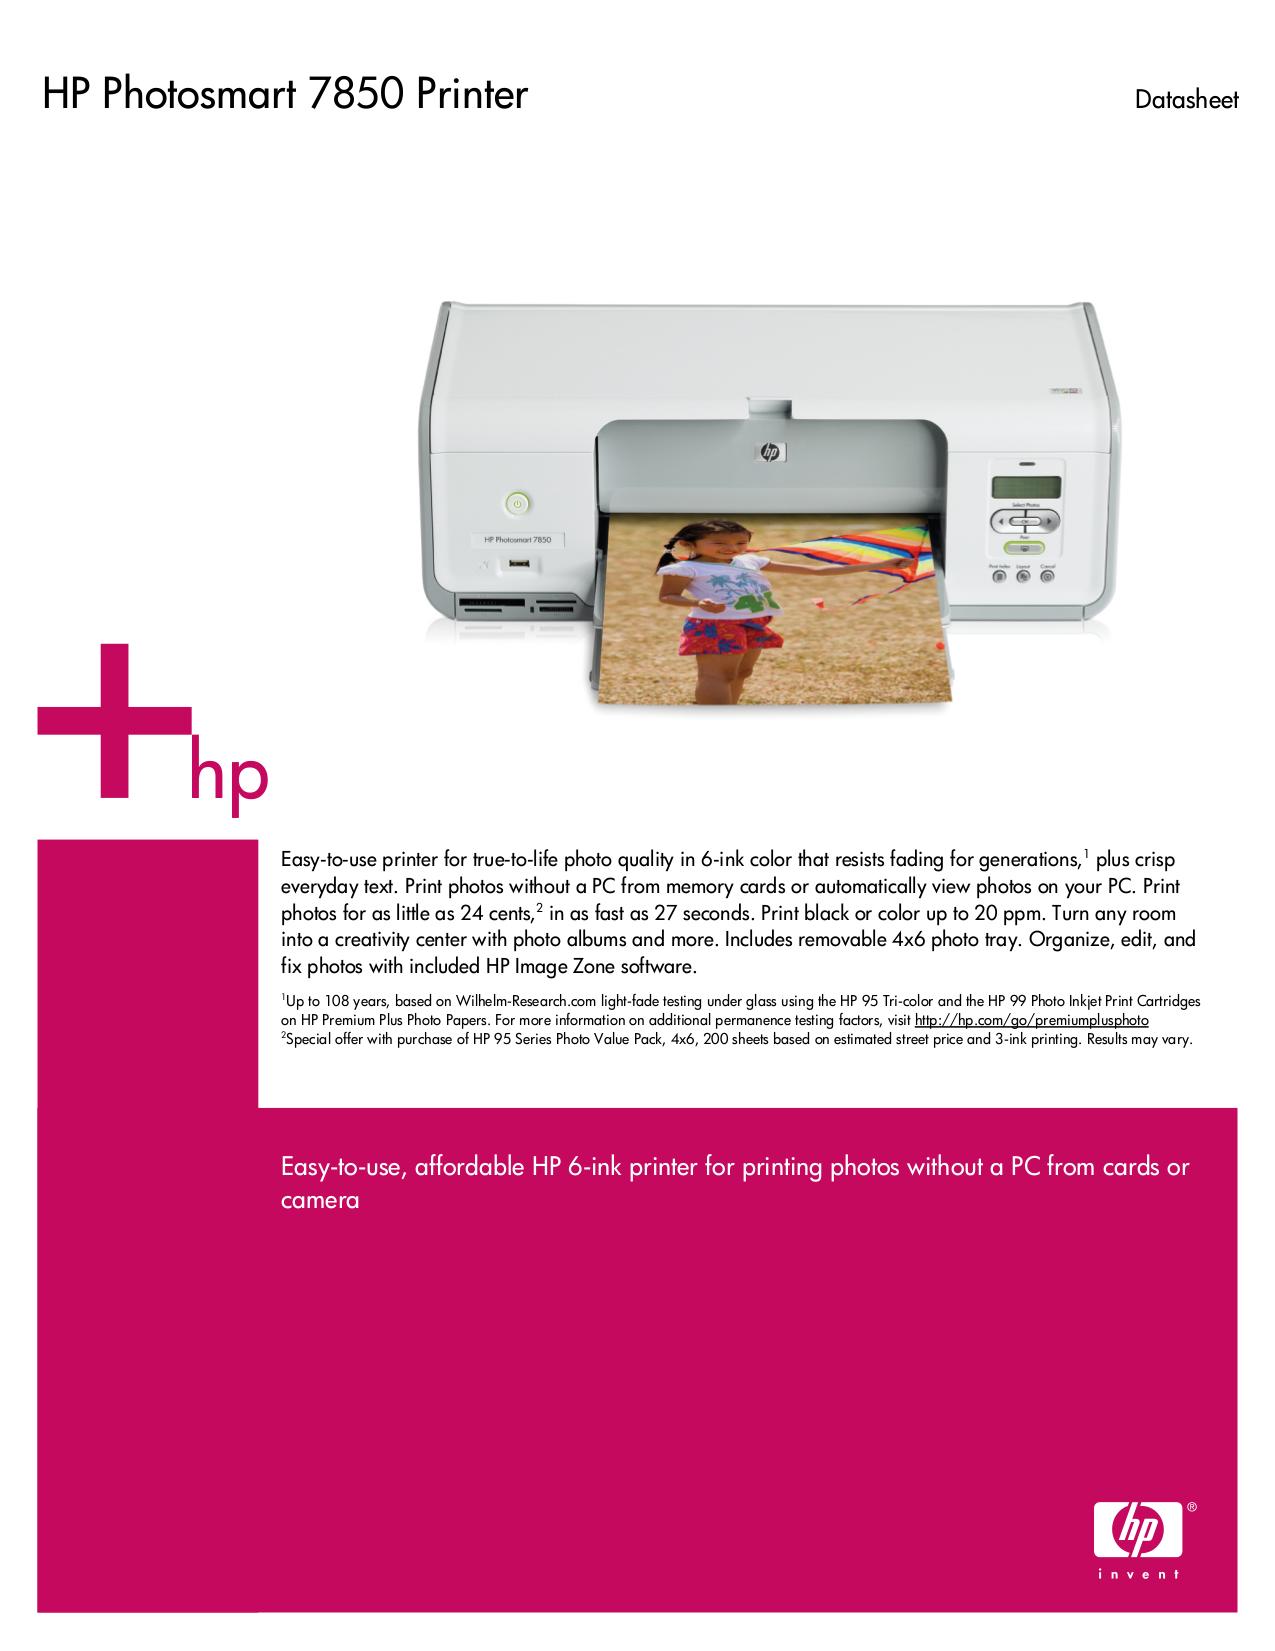 download free pdf for hp photosmart 7850 printer manual rh umlib com hp photosmart 7850 printer manual hp photosmart 7850 manual pdf